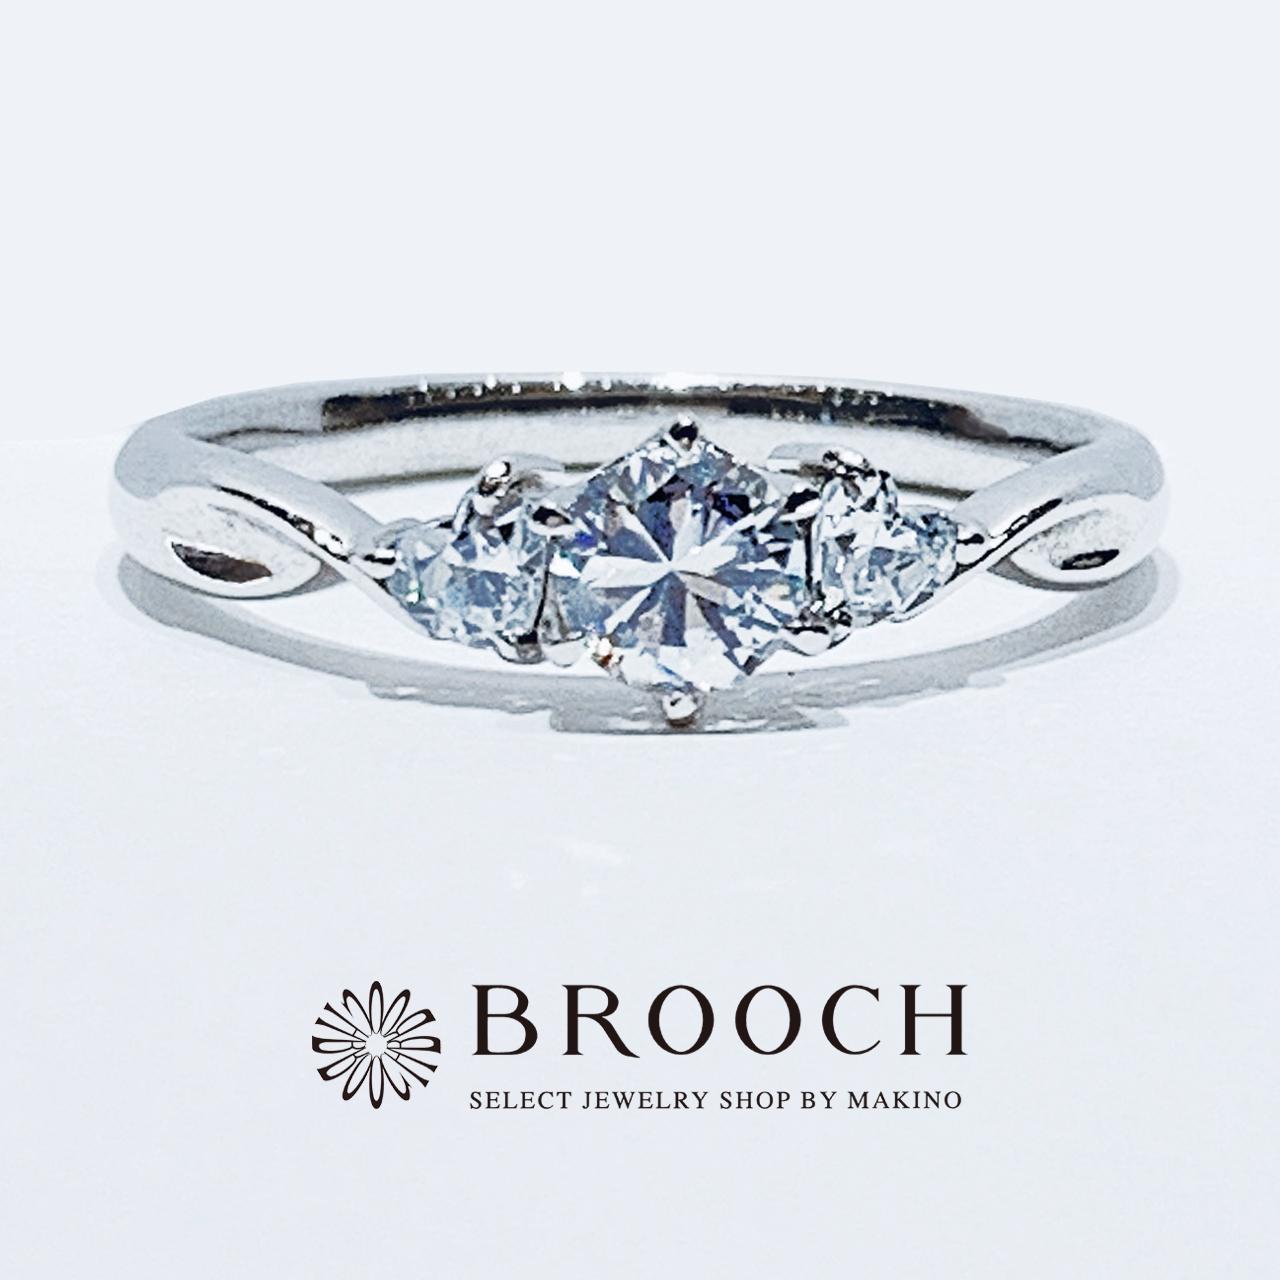 BROOCH 婚約指輪 エンゲージリング シンプルキュート両サイドハートシェイプ